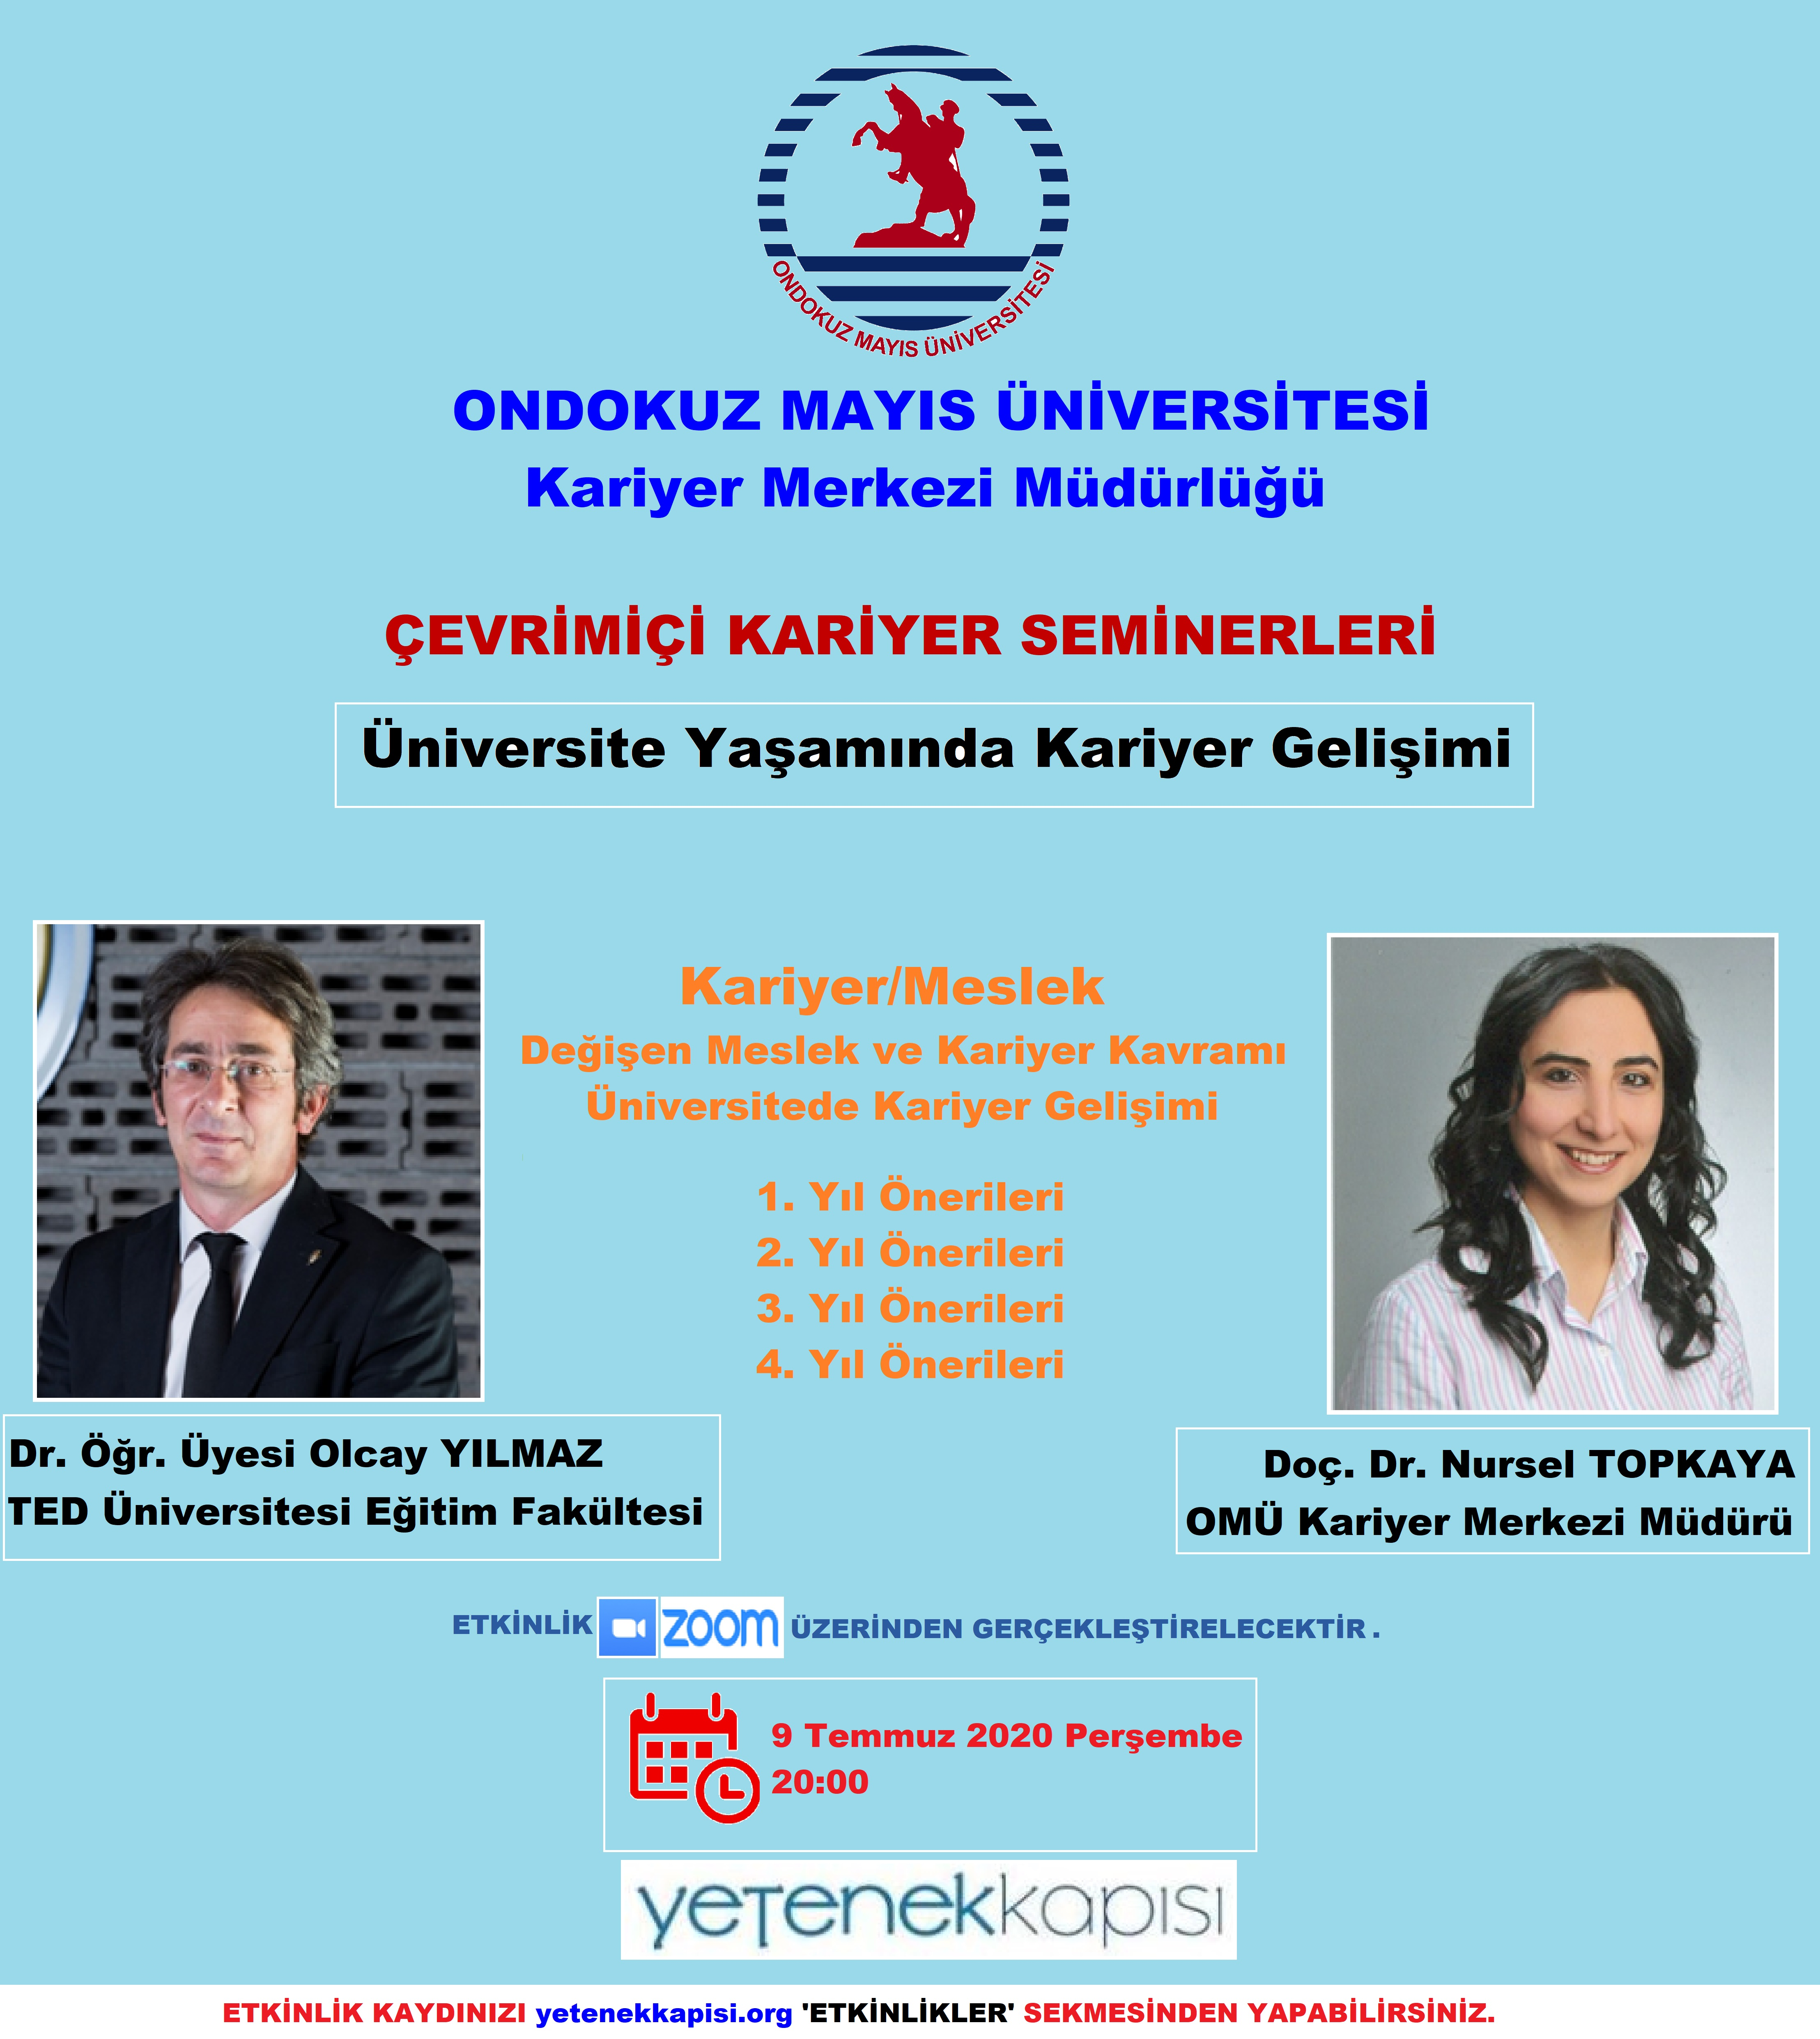 http://www.omu.edu.tr/sites/default/files/universite_yasaminda_kariyer_gelisimi_afis.jpg